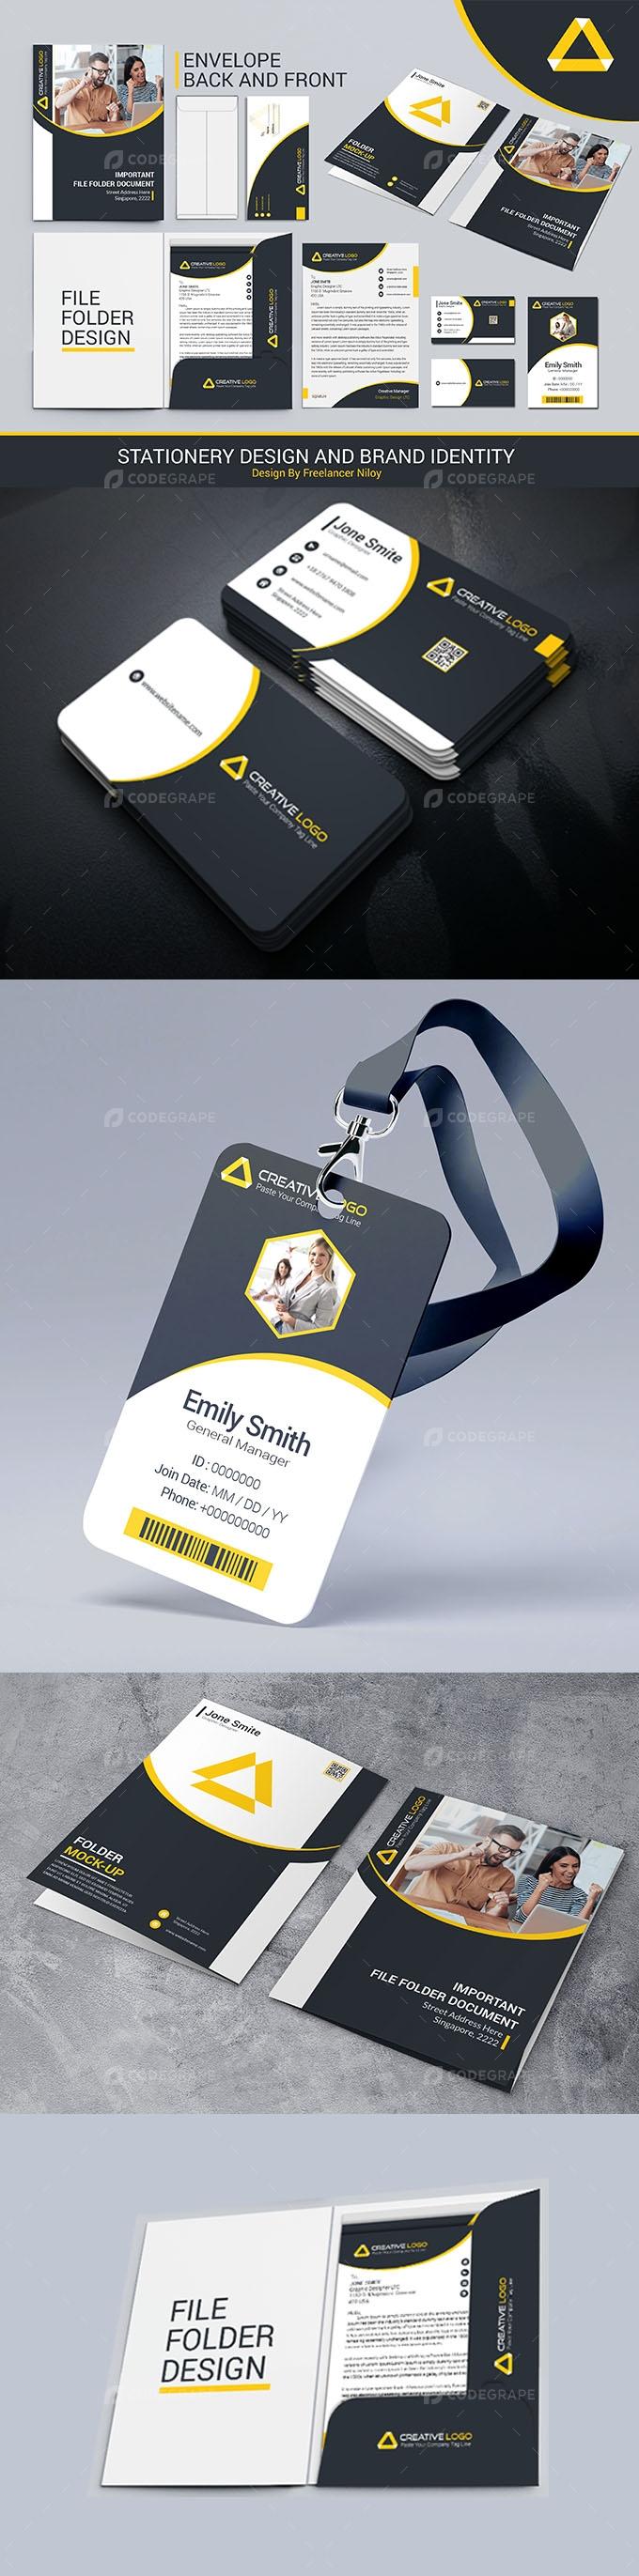 Stationery Item Design and Branding Identity Mega Pack